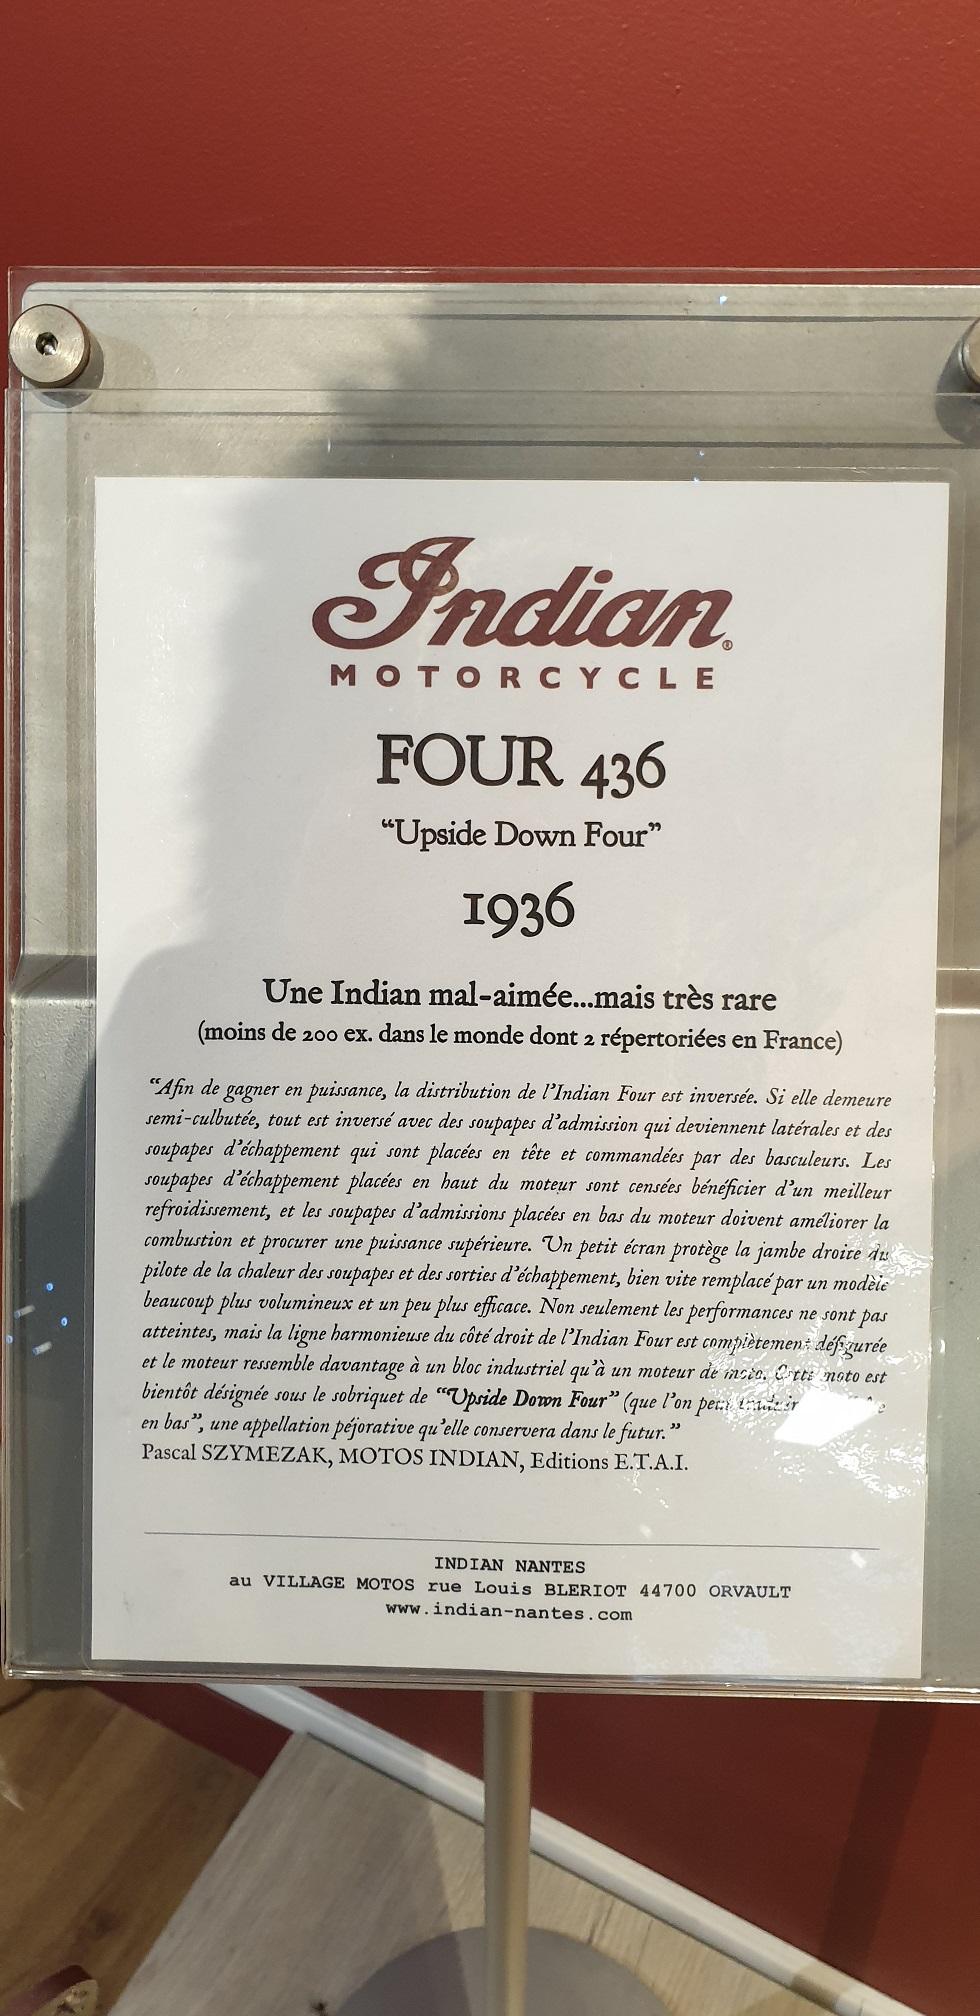 Indian Nantes - ORVAULT village motos 20191153